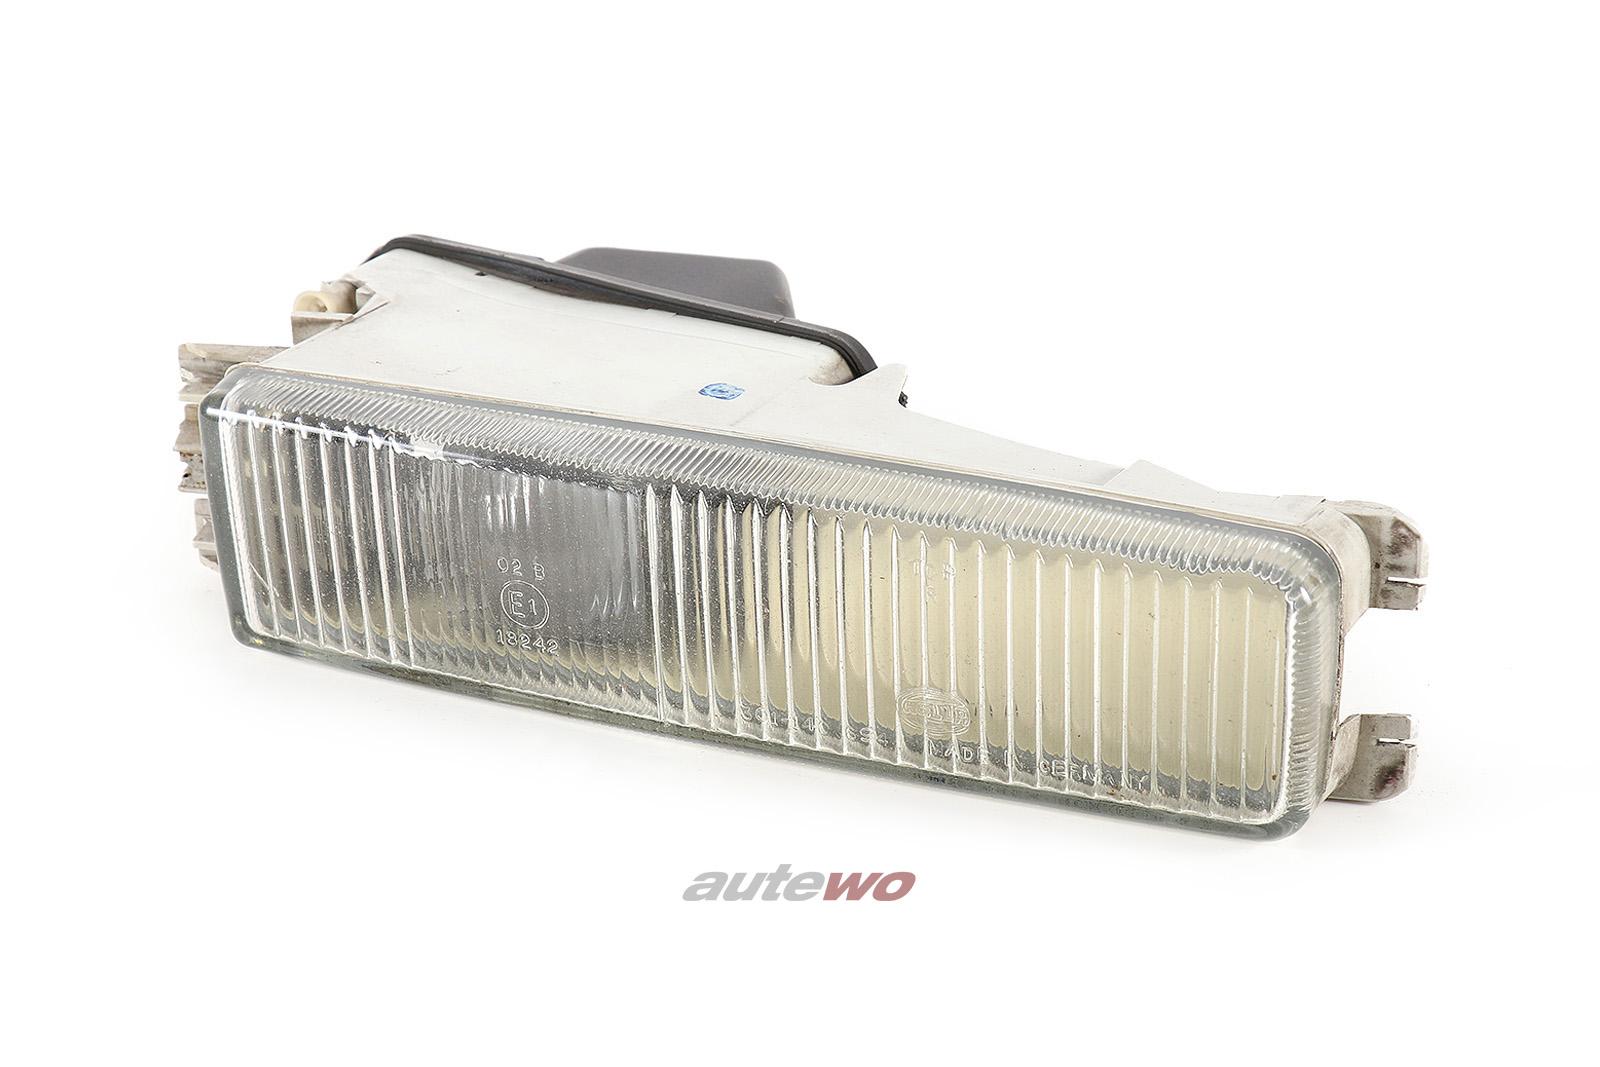 8A0941700 132526-00 Audi 80 B4/S2 Coupe/Cabrio Typ 89 Nebelscheinwerfer Rechts